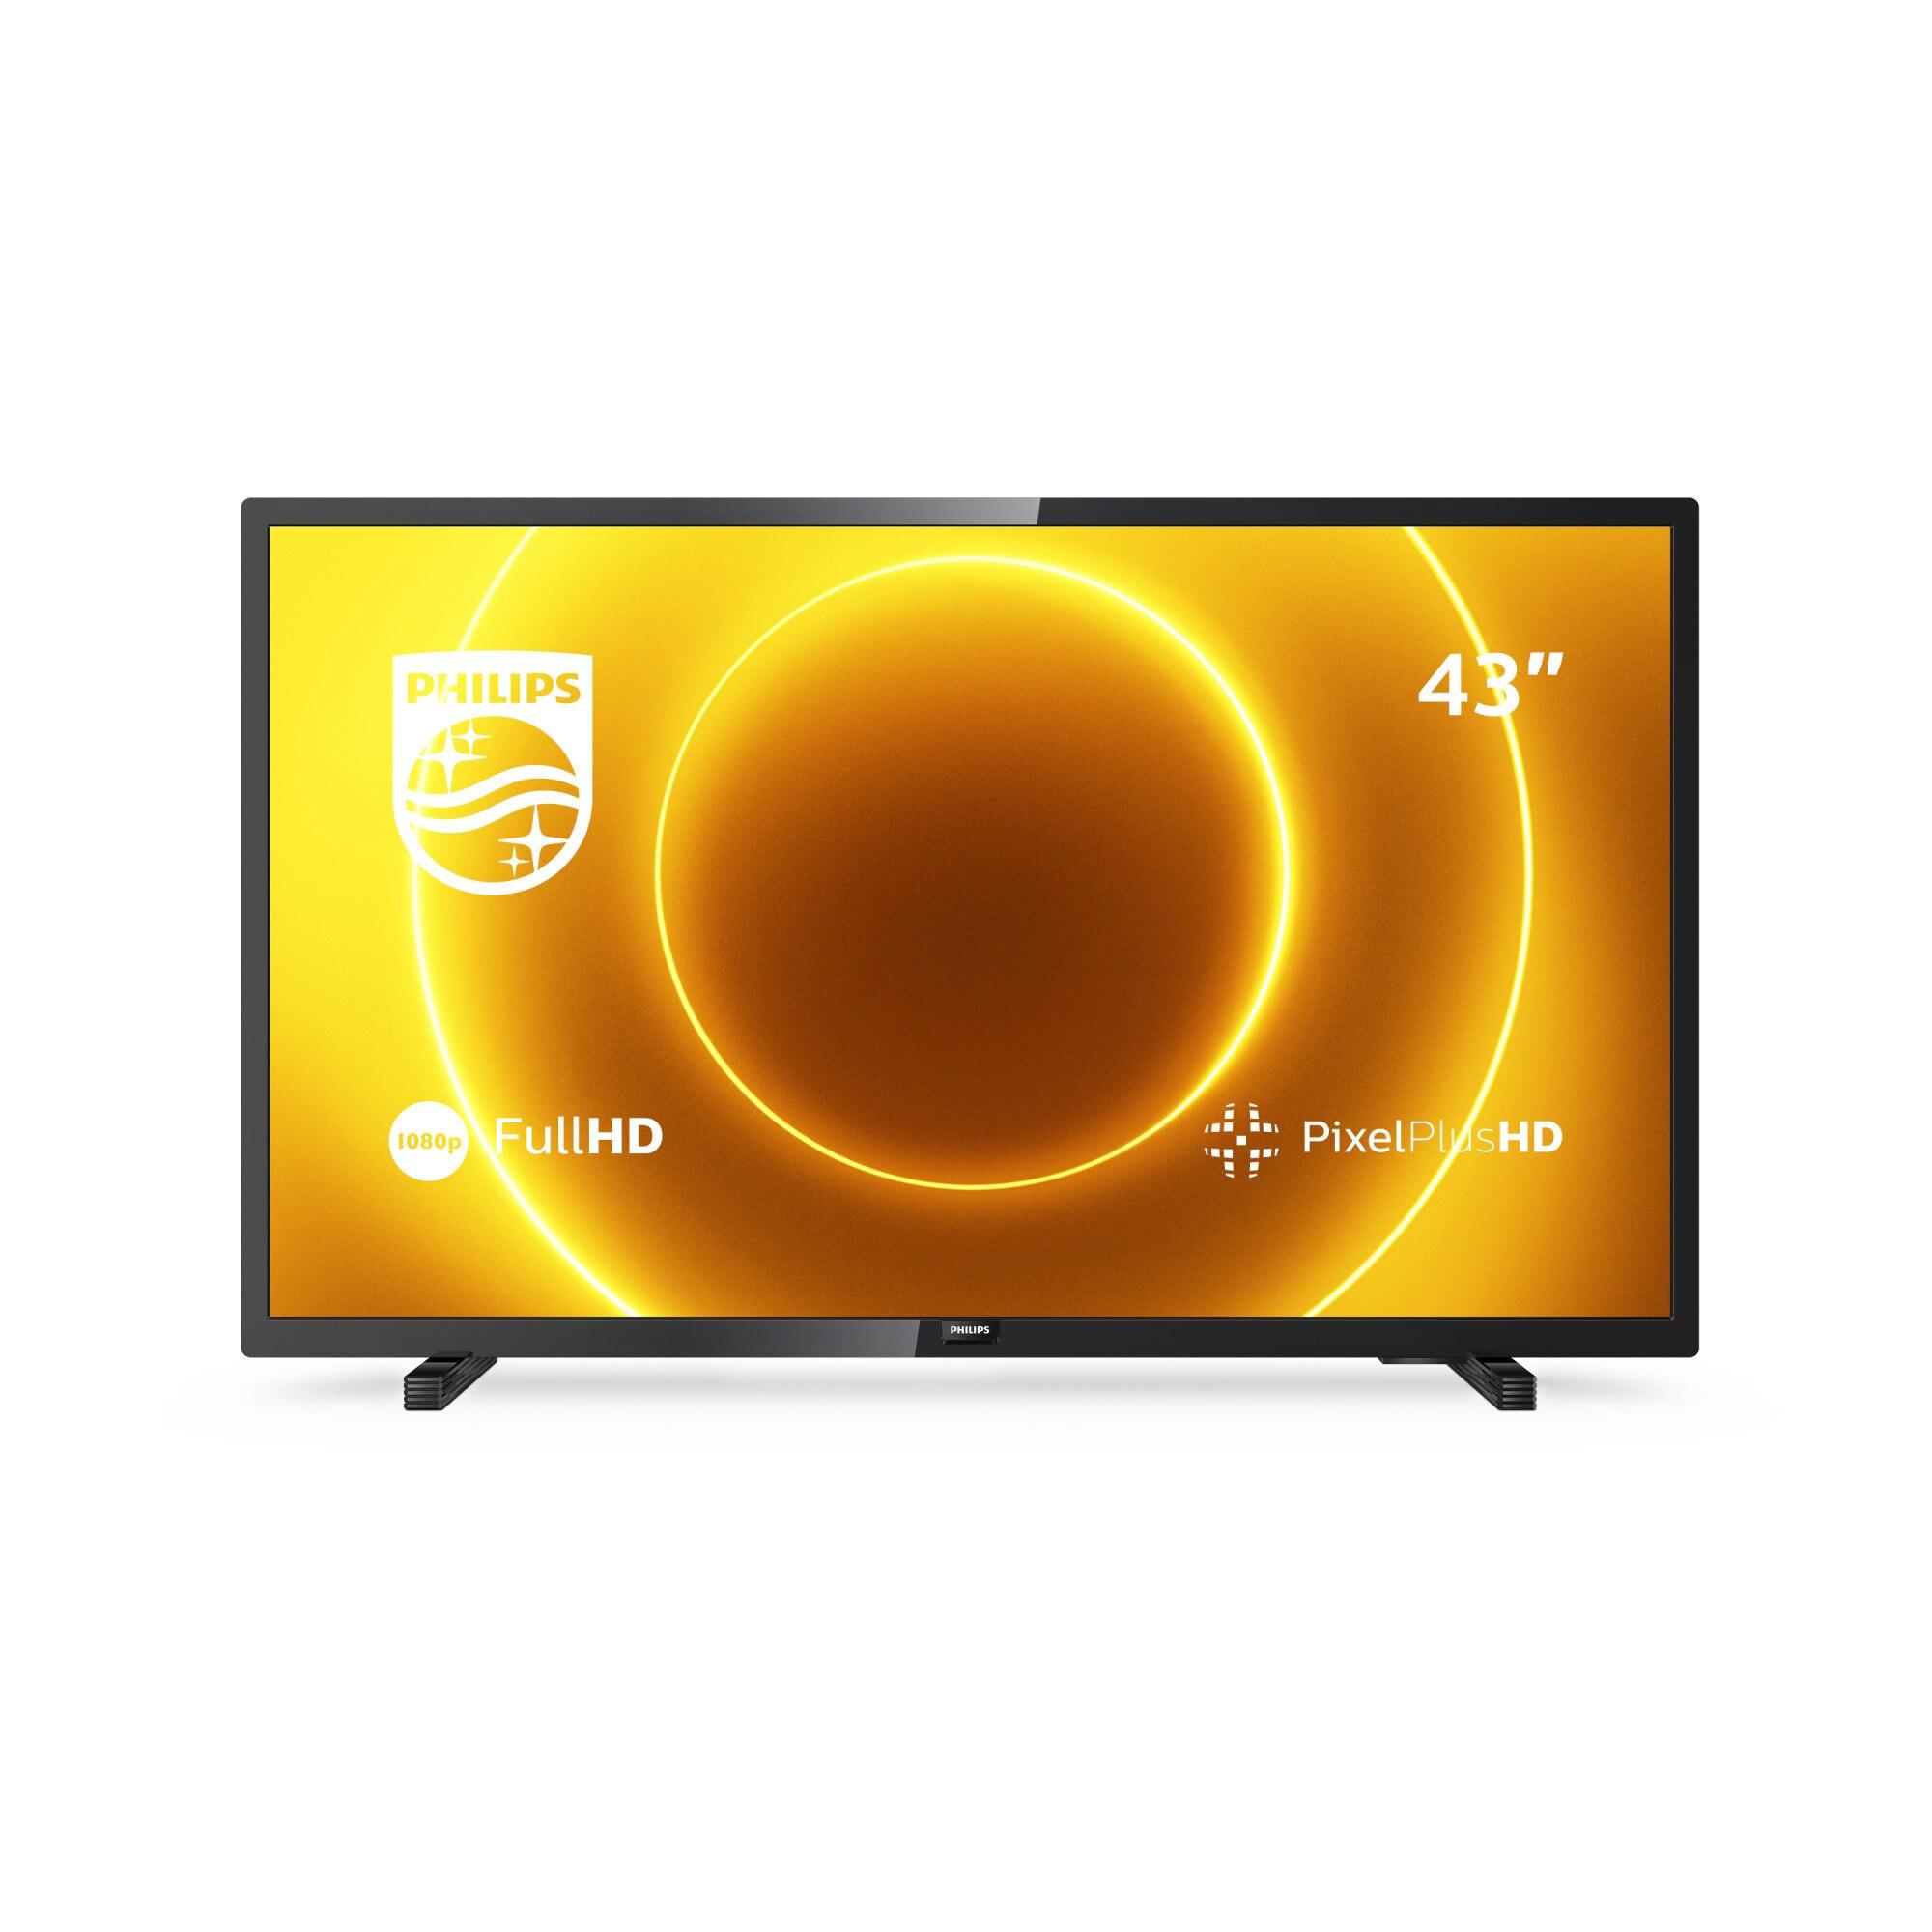 Fotografie Televizor Philips 43PFS5505/12, 108 cm, Full HD, LED, Clasa A+